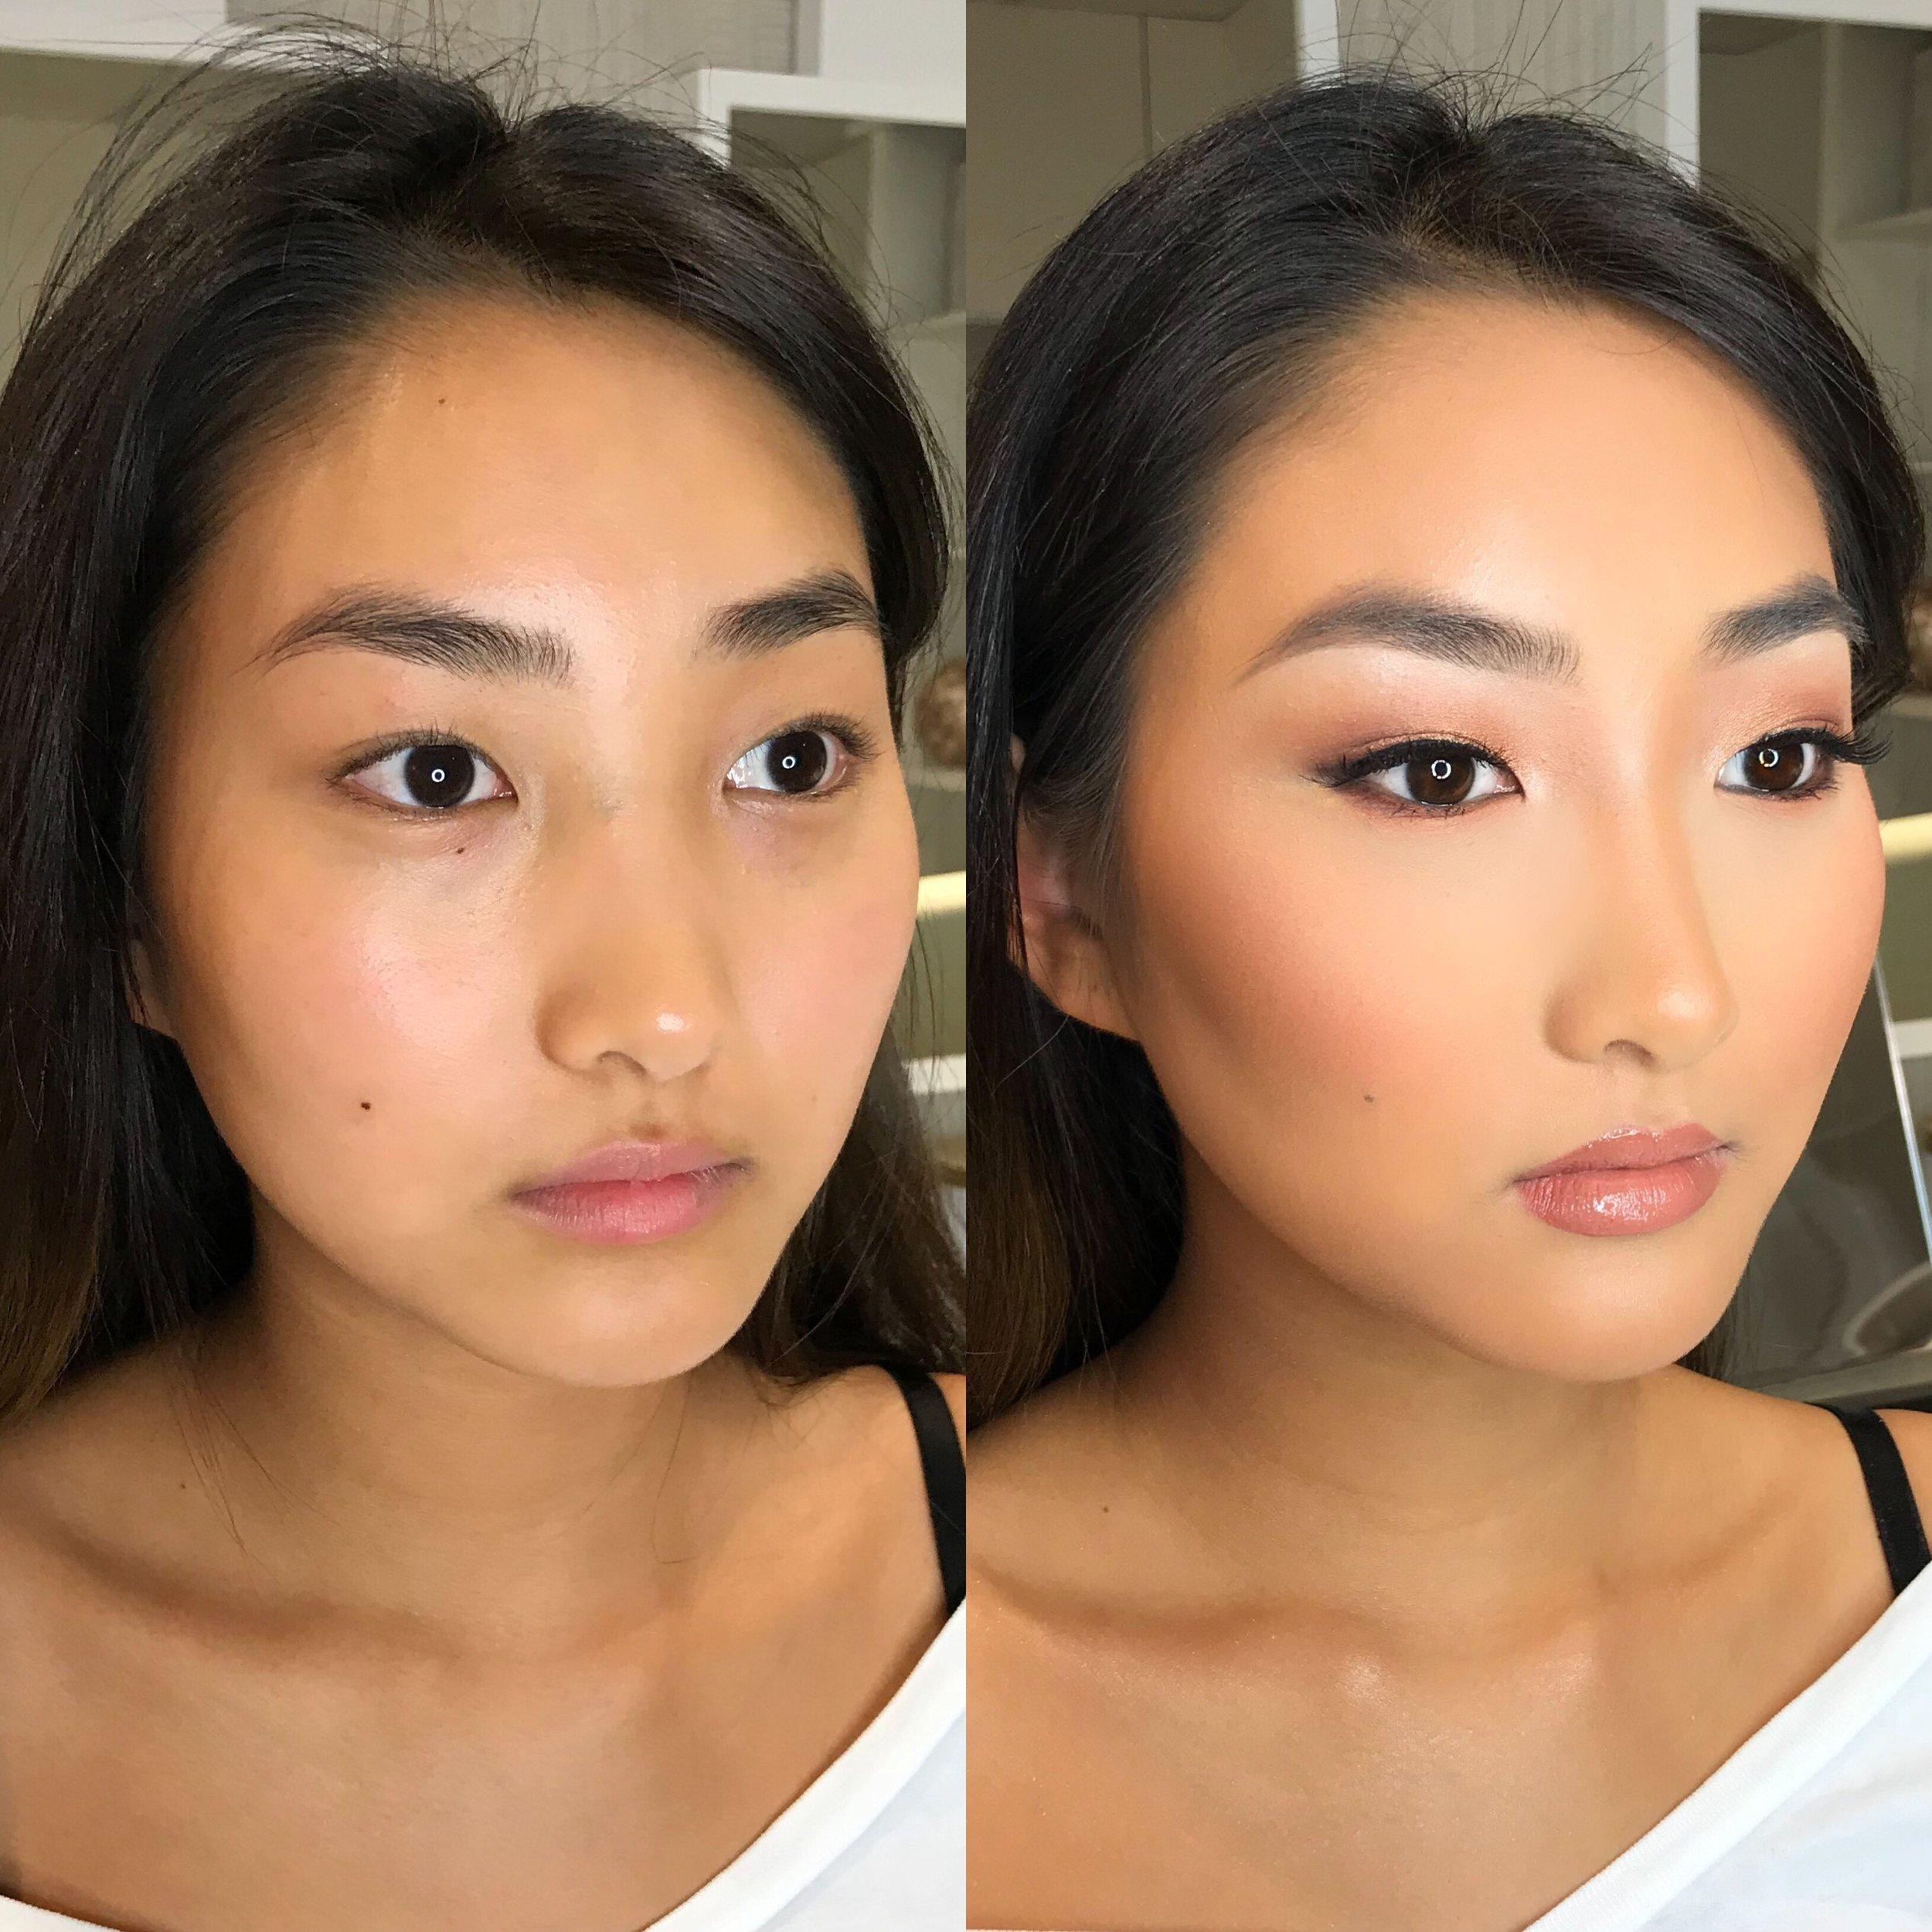 Patricia_Castro_Makeup_Los_Angeles_Makeup_Artist_23.JPG